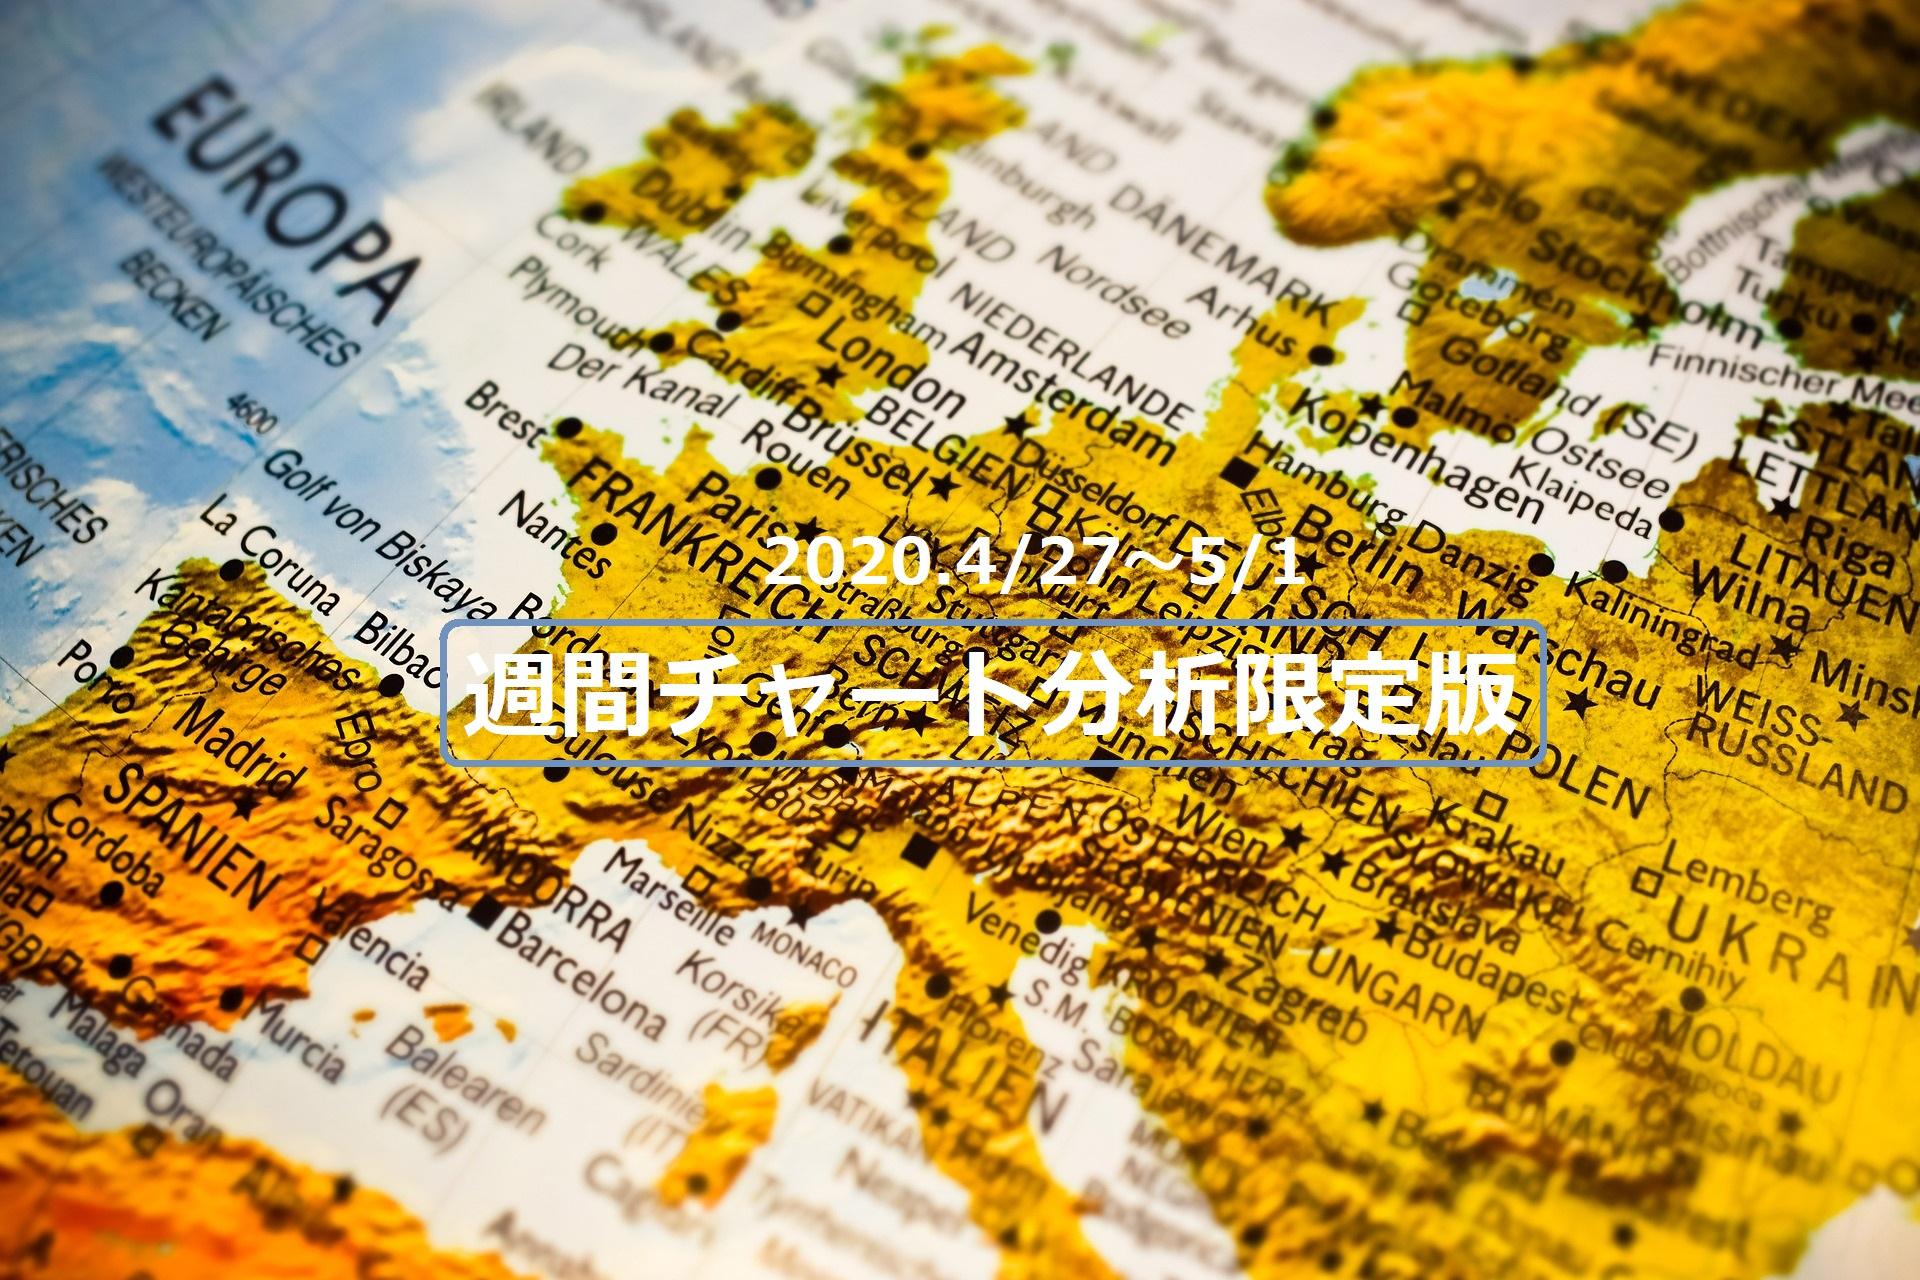 【FX】週間チャート分析限定版【2020.4/27~5/1】